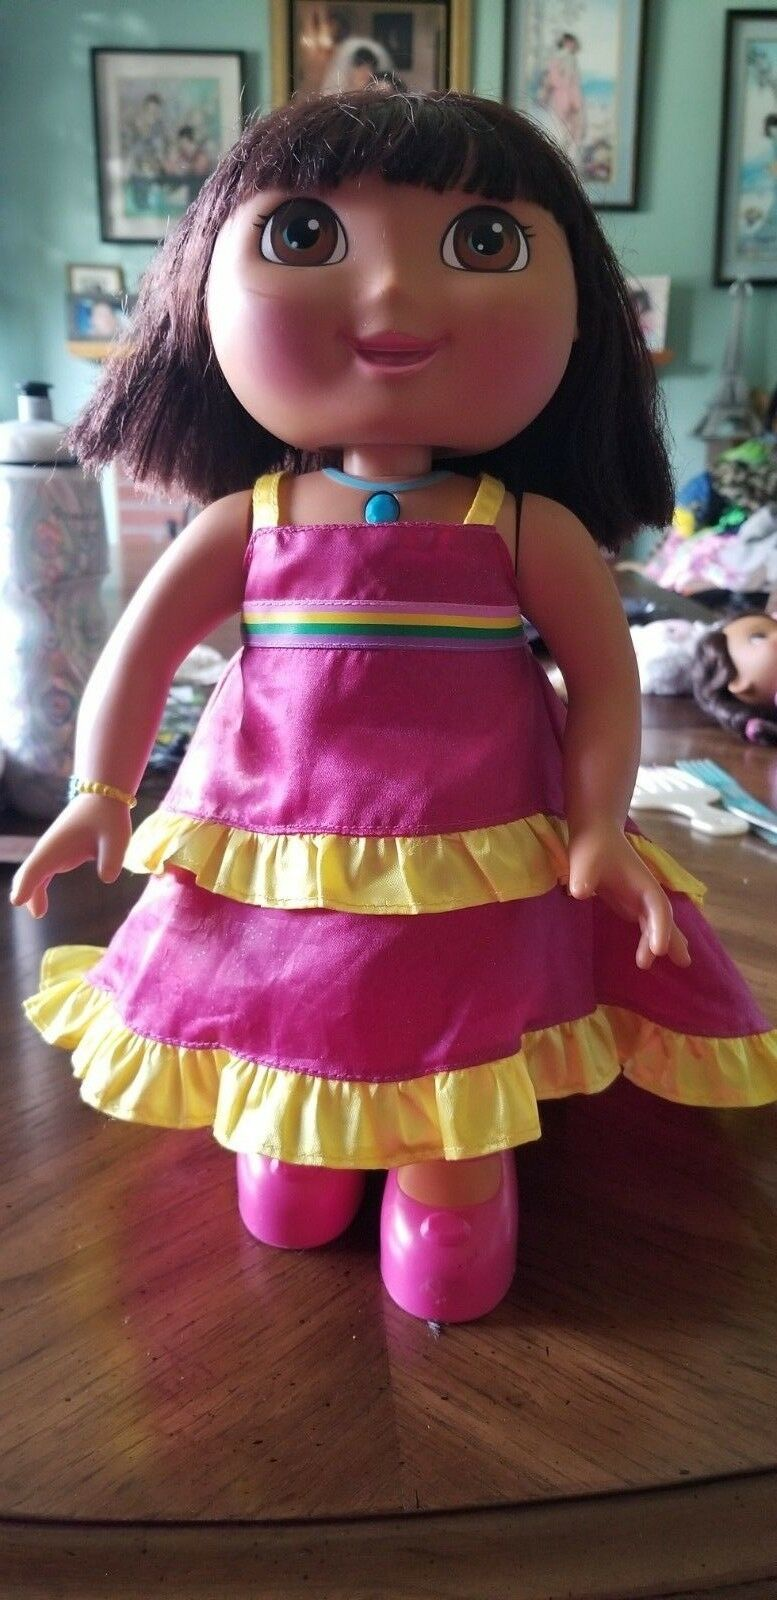 Dance Around Dora The Explorer Pink Dancing Crystal Crystal Crystal Kingdom Electronic Doll 14  f58532